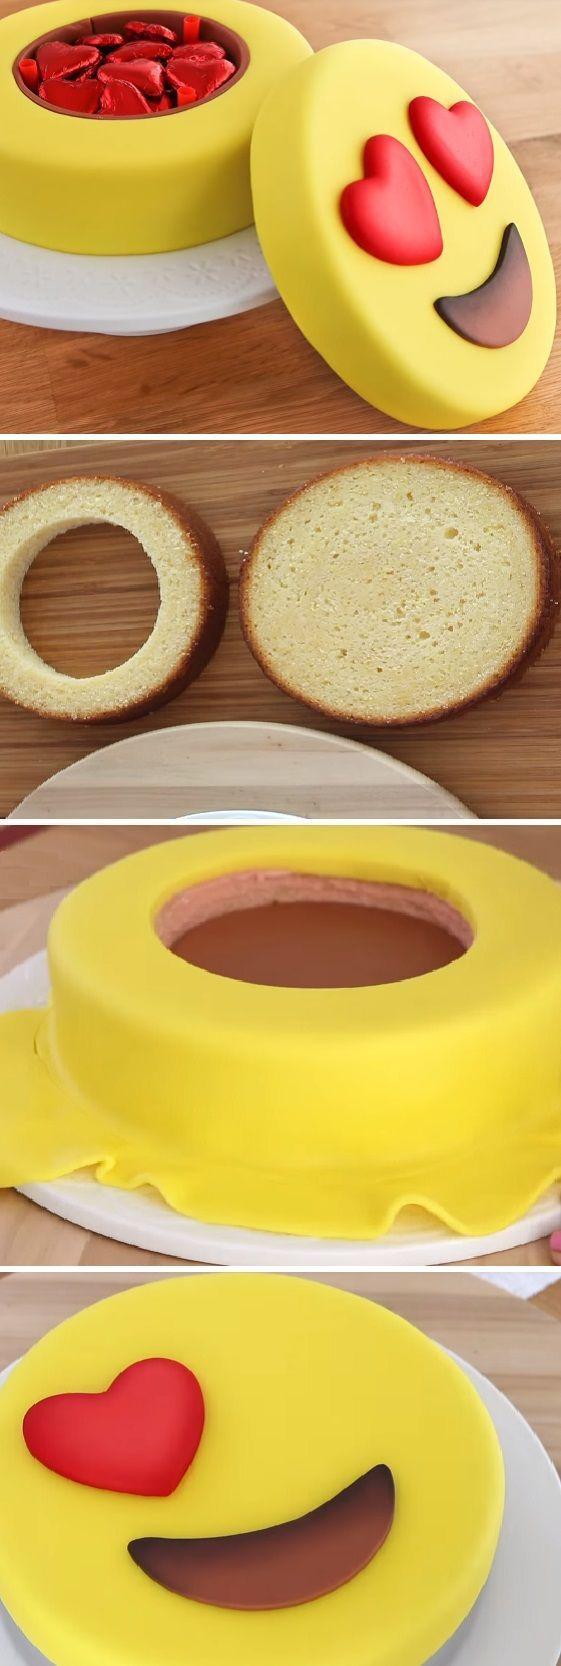 Torta de Emoji para San Valentín con el Secreto Caja de Bombones. Recetas románticas¨ #sanvalentin #valentinesday #valentine #love #azúcar #tips #cupcakes #cakes #dulces #receta #recipe #casero #torta #tartas #pastel #nestlecocina #bizcocho #bizcochuelo #tasty #cocina #chocolate #pan #panes Si te gusta dinos HOLA y dale a Me Gusta MIREN … #recetasdecocina